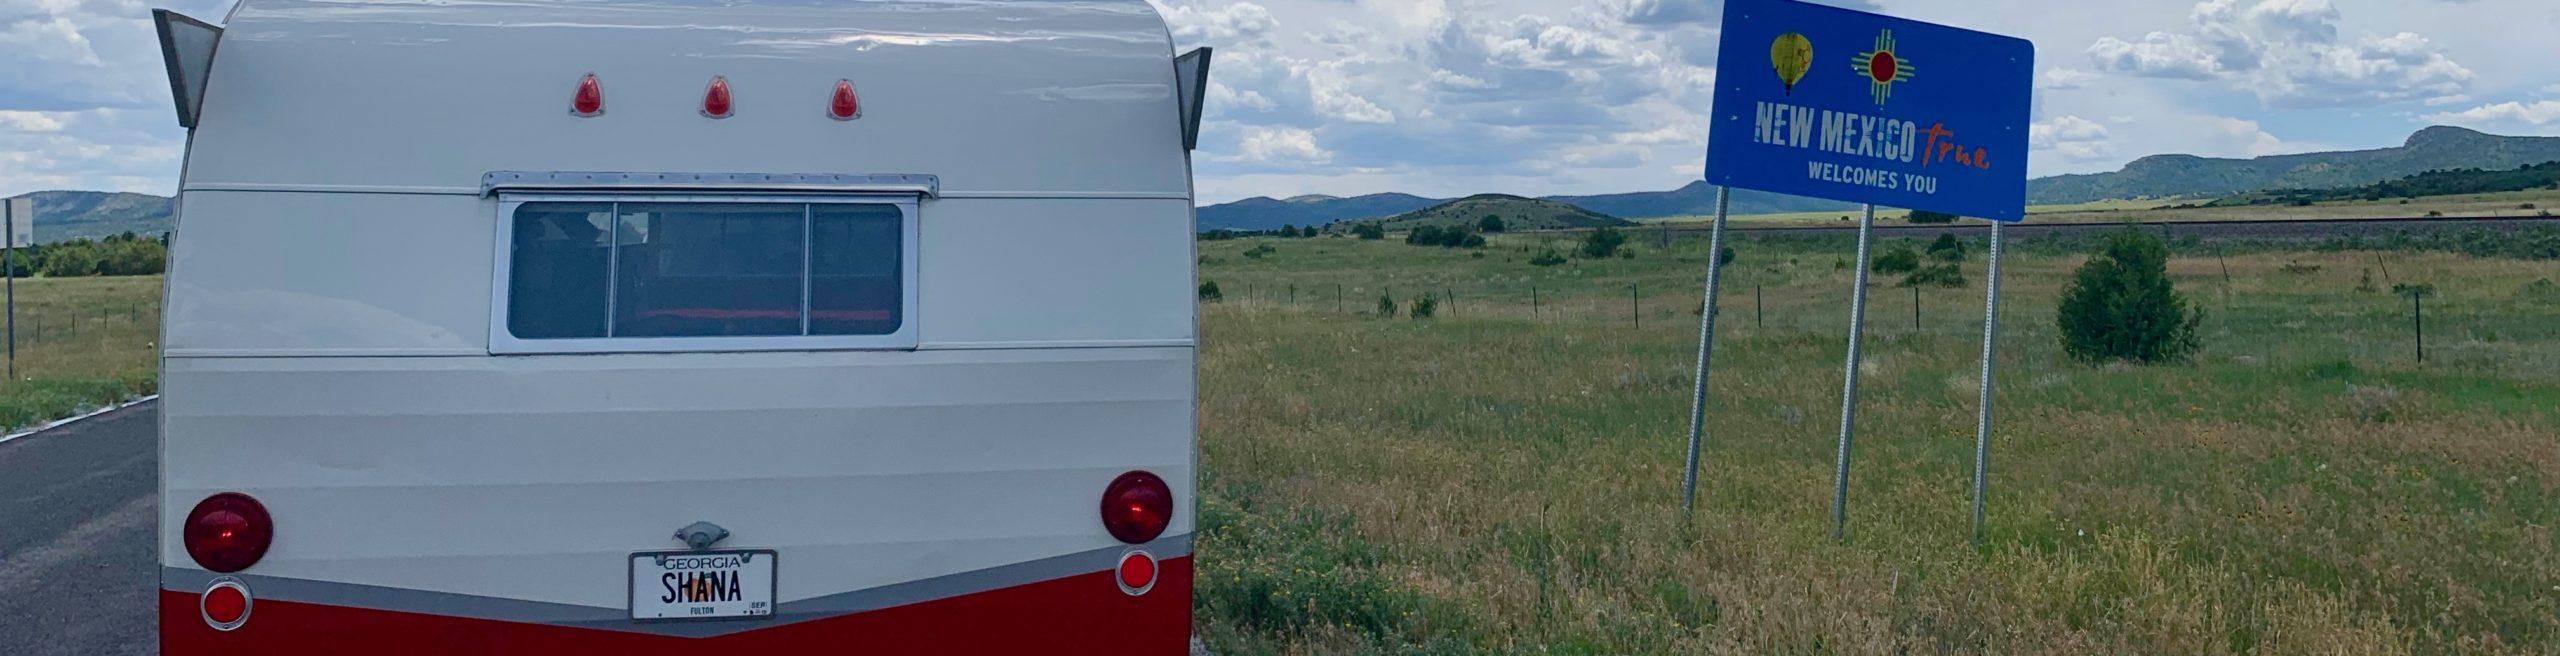 Retro Red Shasta Airflyte Deluxe Vintage Camper